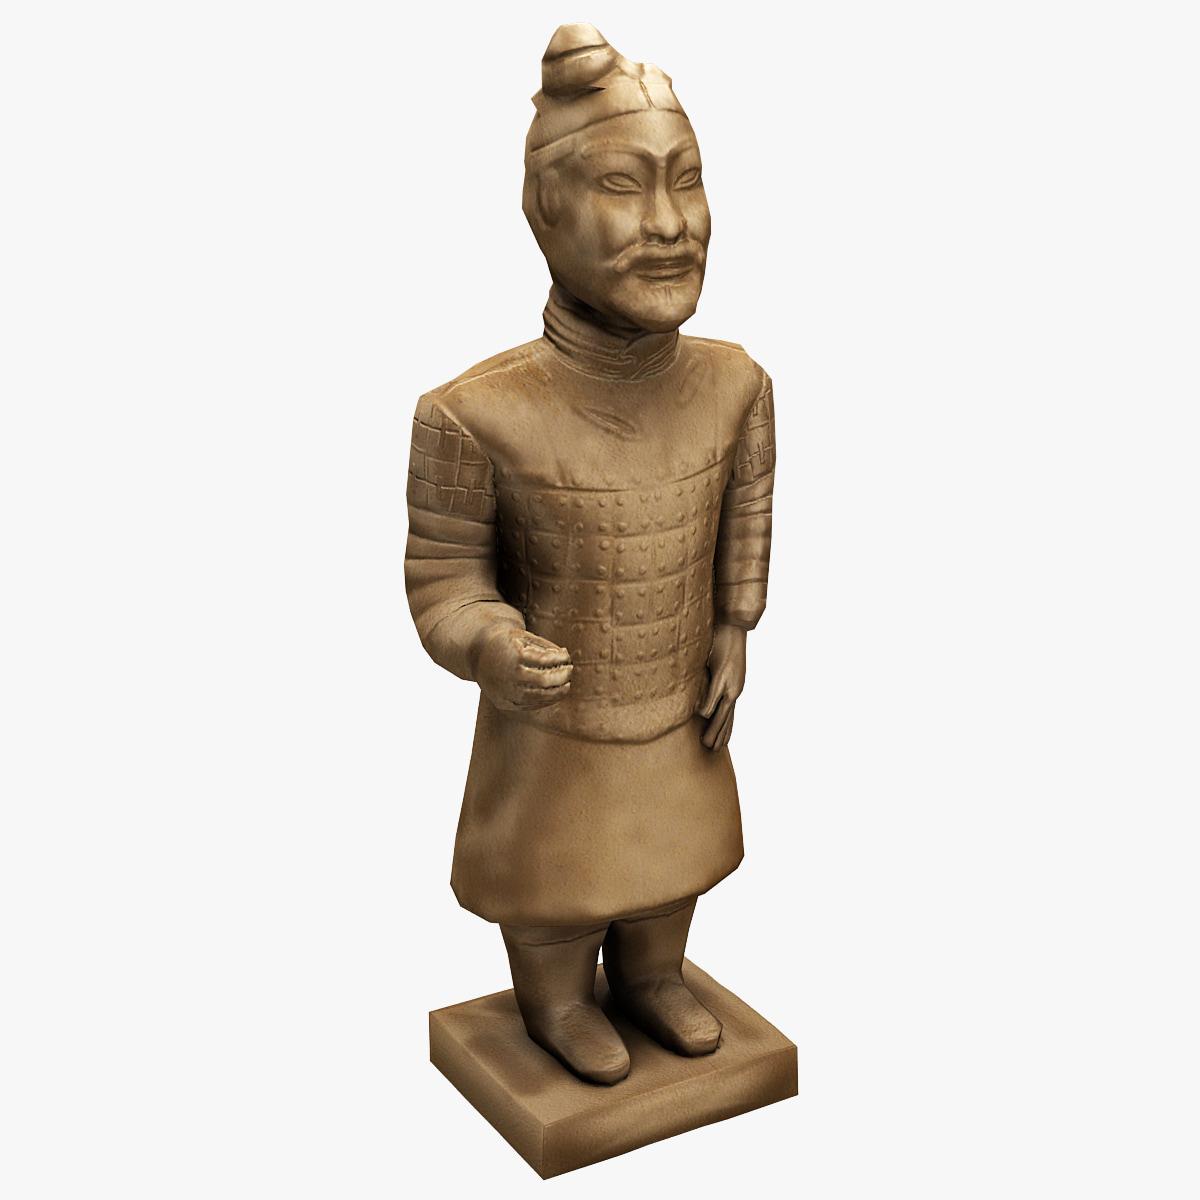 China_Terracotta_Warrior_V3_0002.jpg